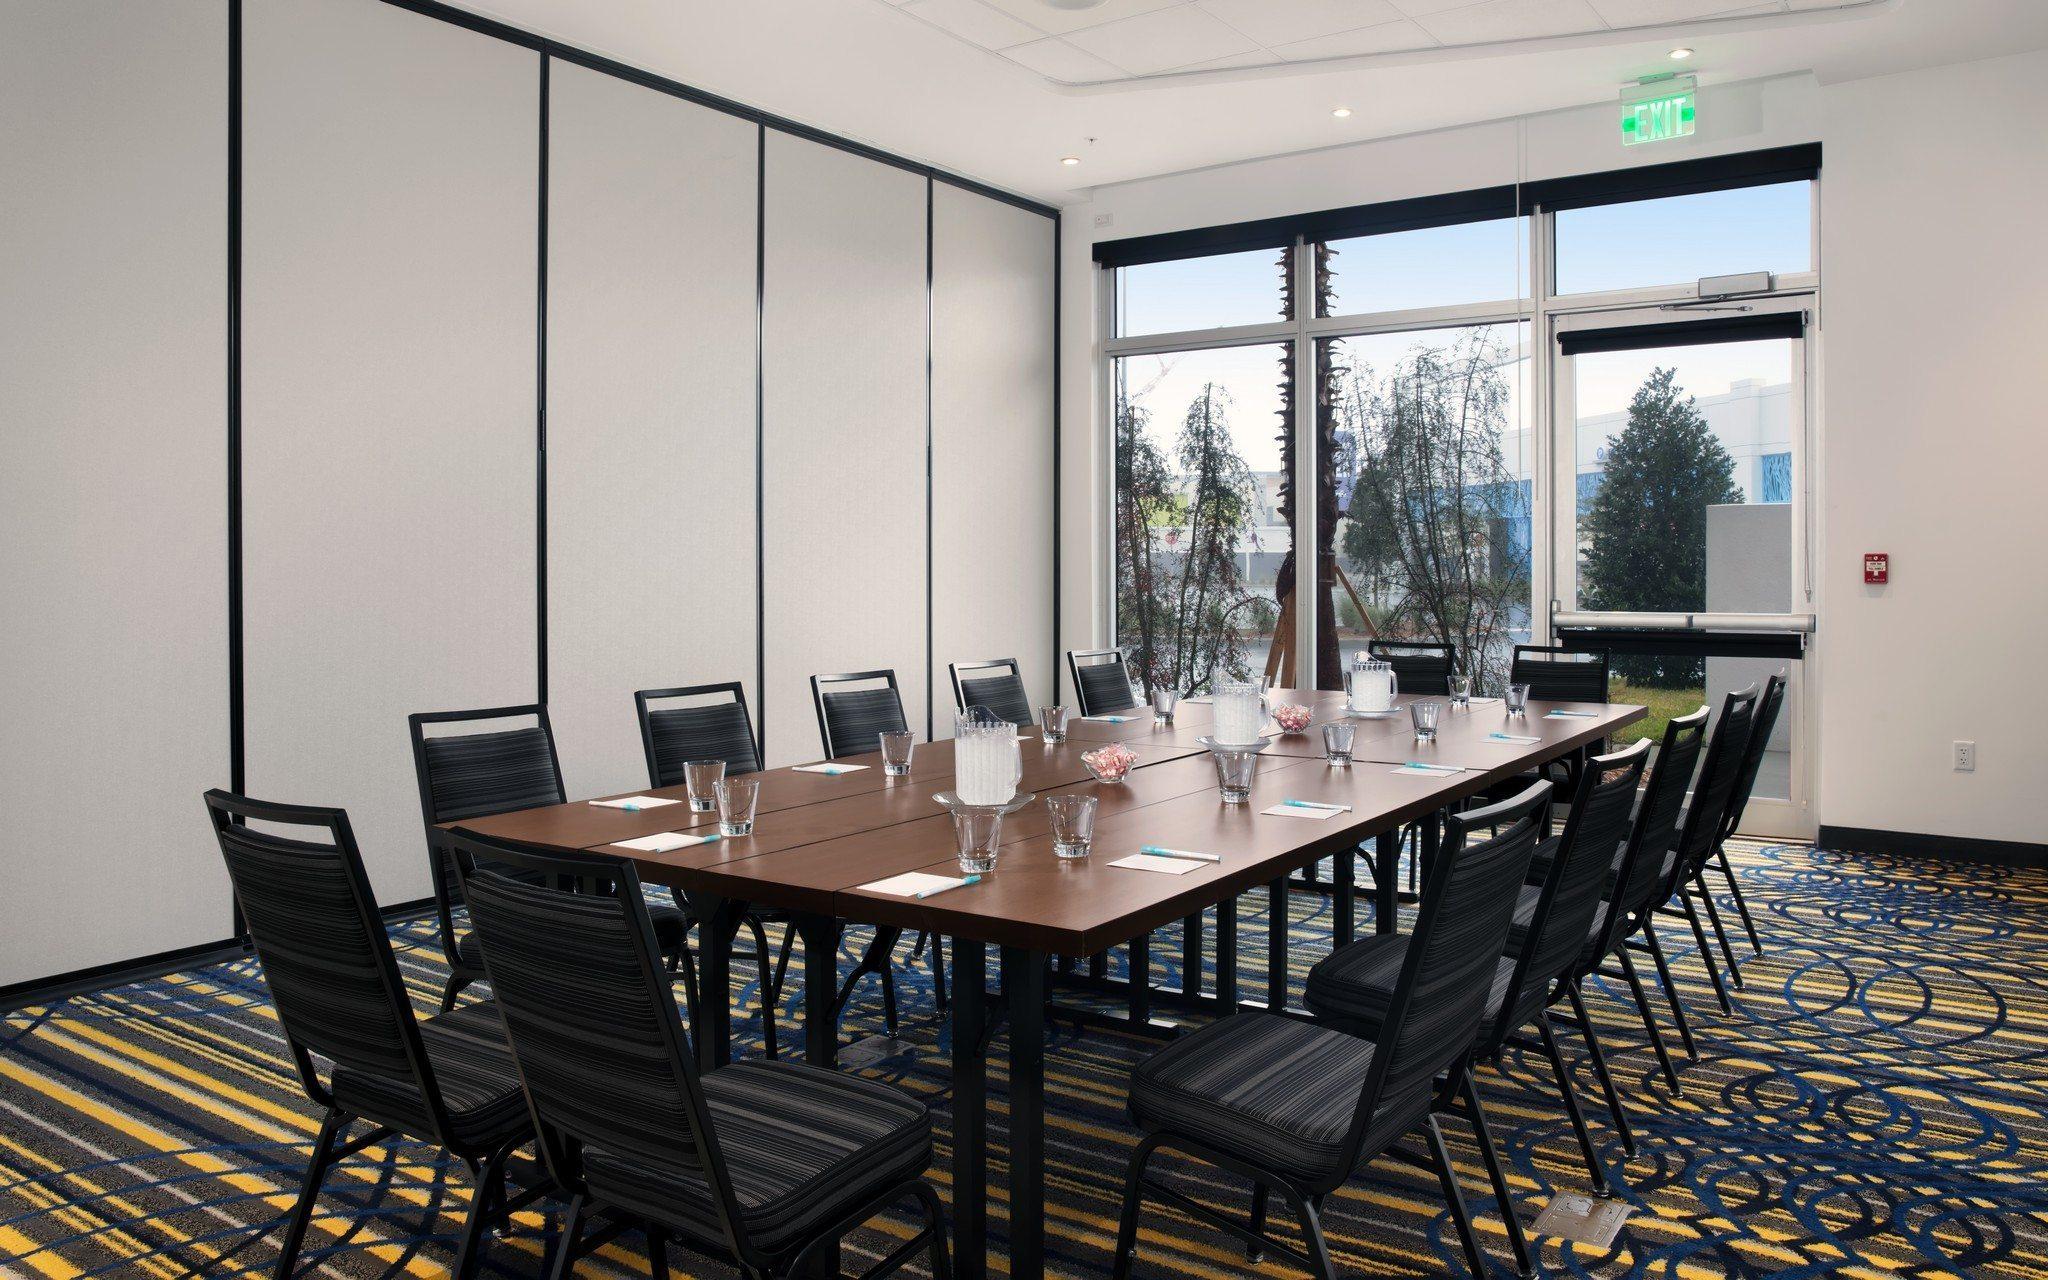 Fairfield Inn & Suites Daytona Beach Speedway/Airport meeting room